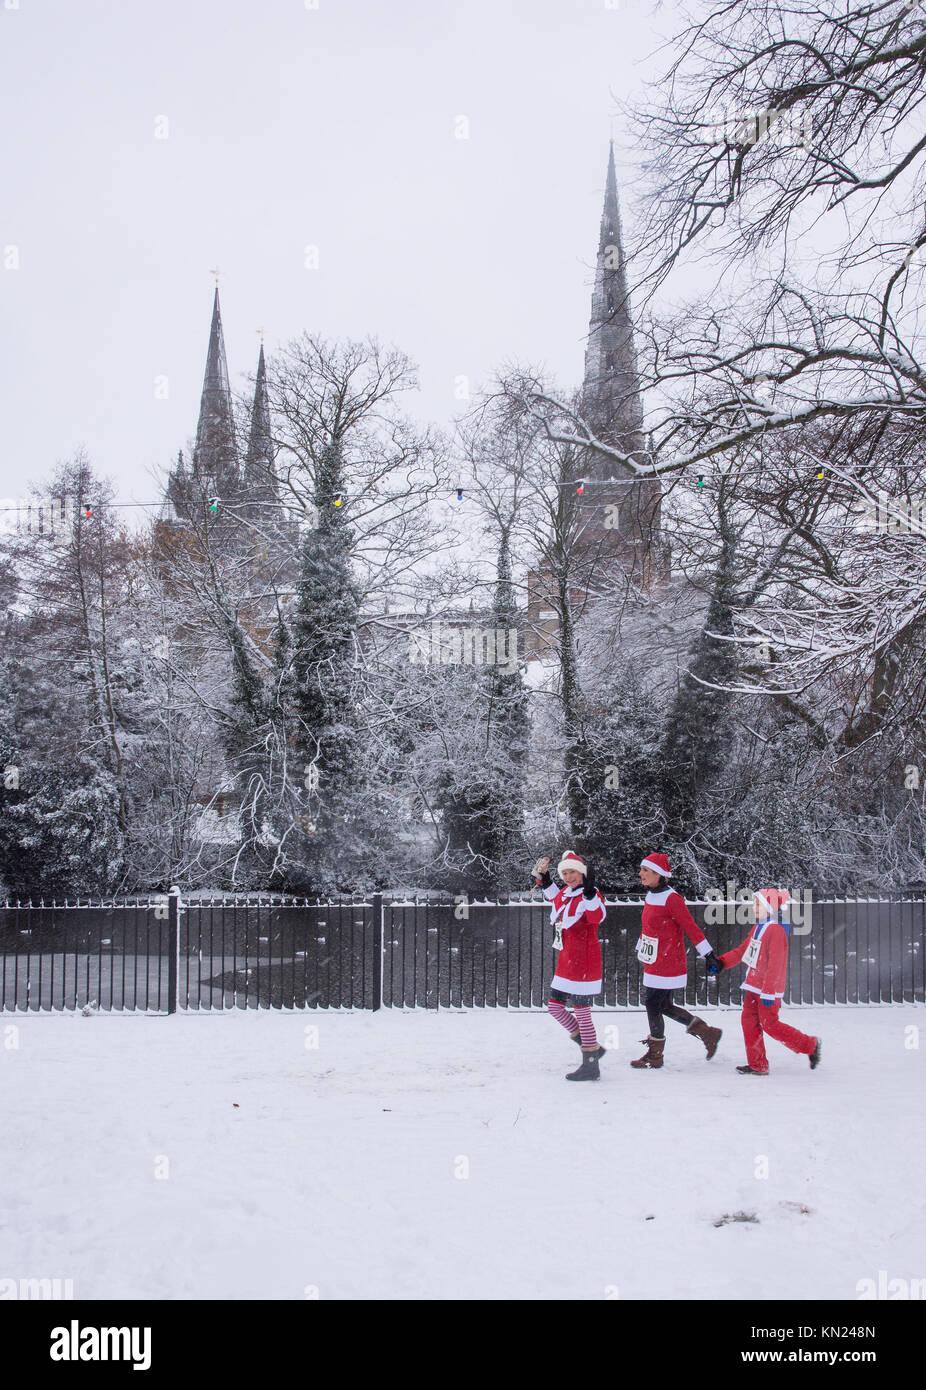 Lichfield, UK. 10th Dec, 2017. Three participants in the Lichfield Santa Dash run along Minster Pool with Lichfield - Stock Image